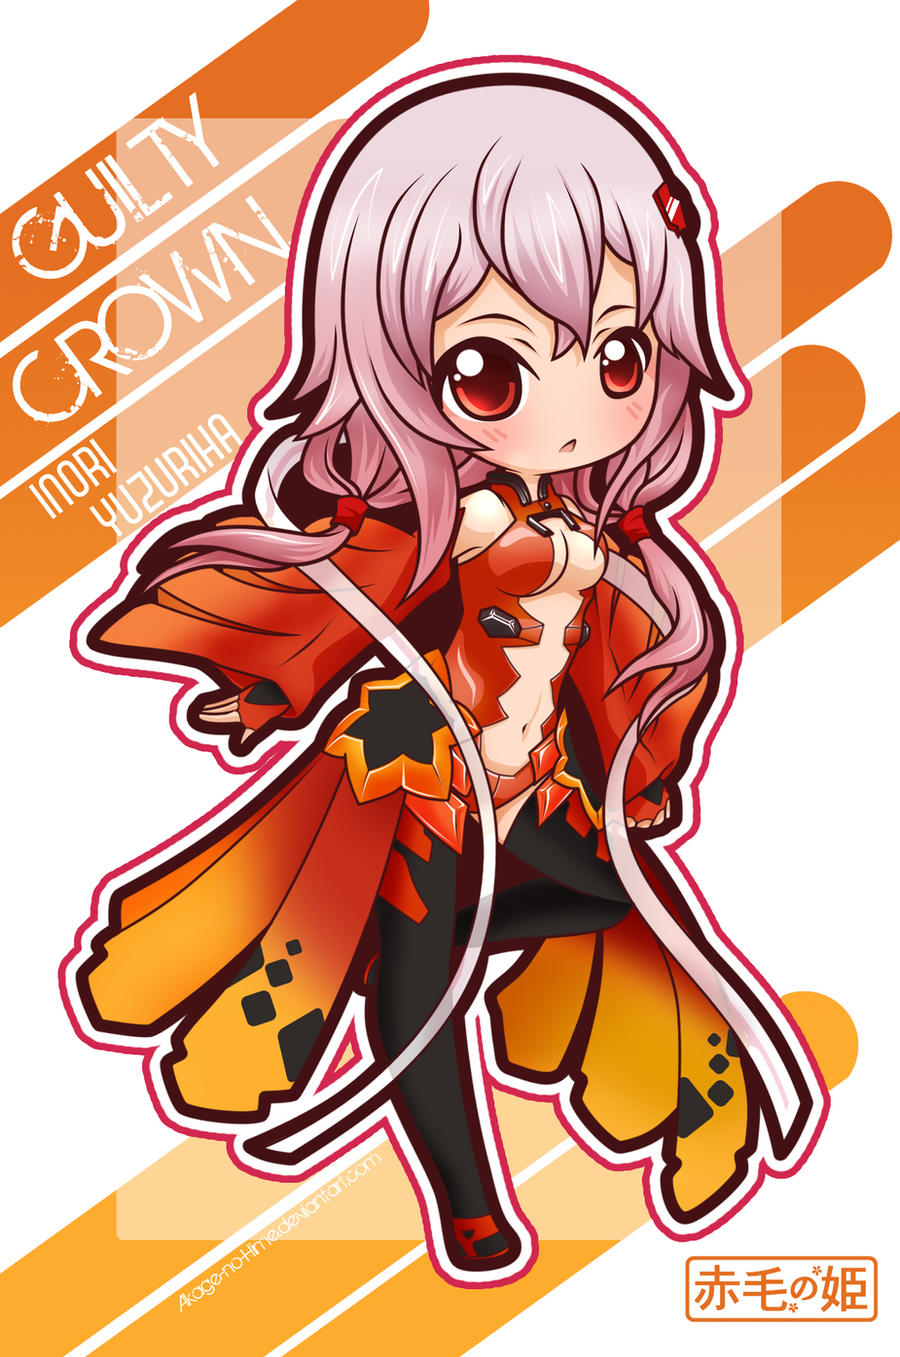 Guilty Crown - Inori Yuzuriha by Akage-no-Hime